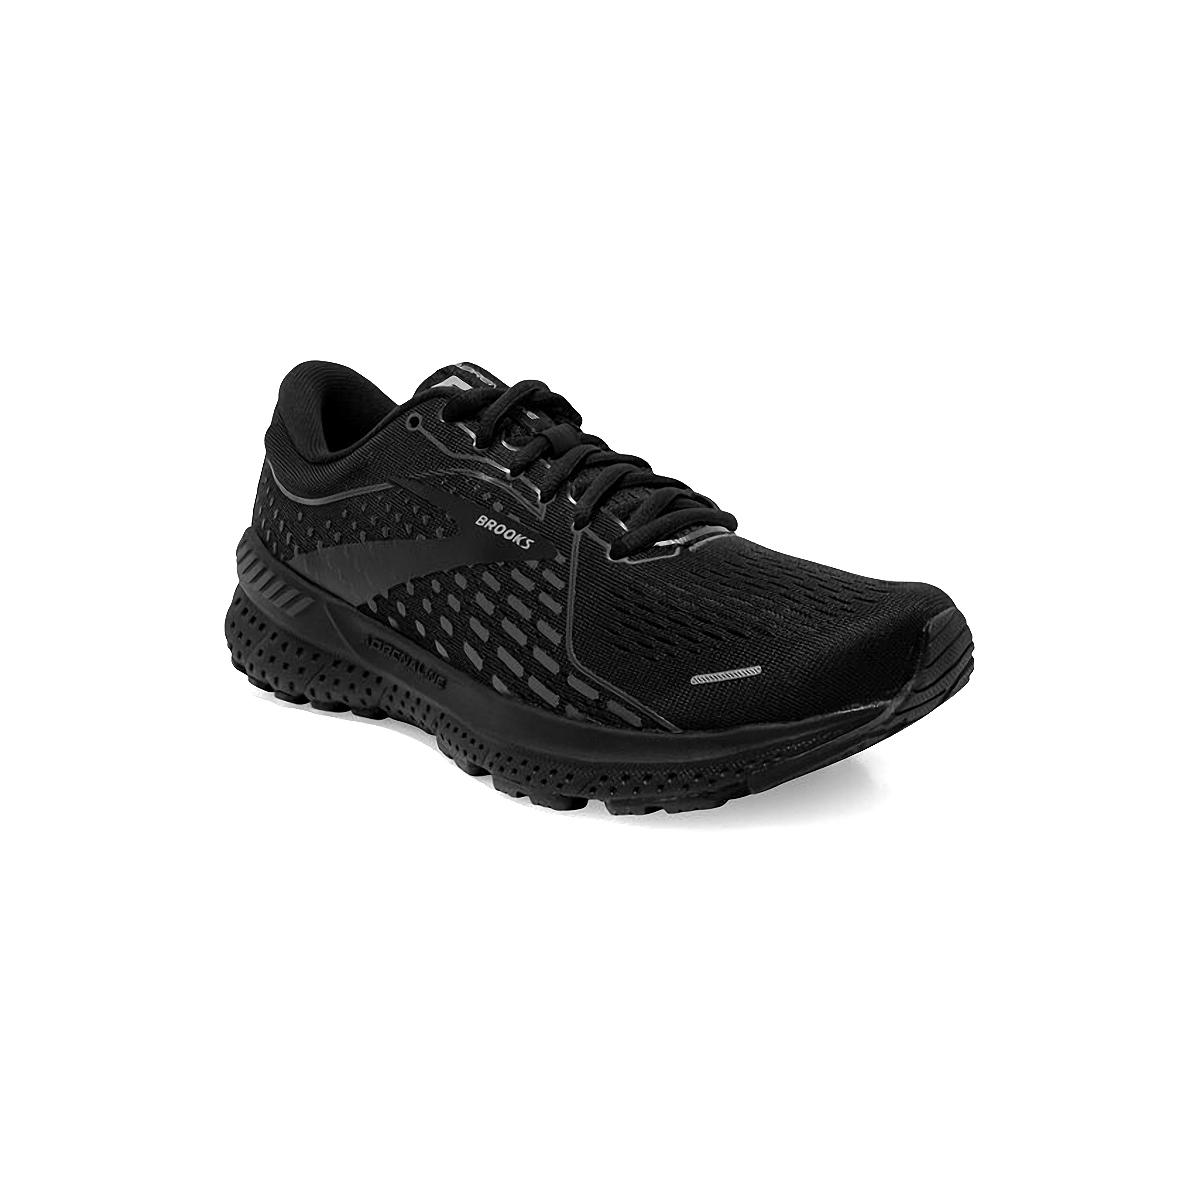 Women's Brooks Adrenaline GTS 21 Running Shoe - Color: Black/Black/Ebony - Size: 5 - Width: Regular, Black/Black/Ebony, large, image 3